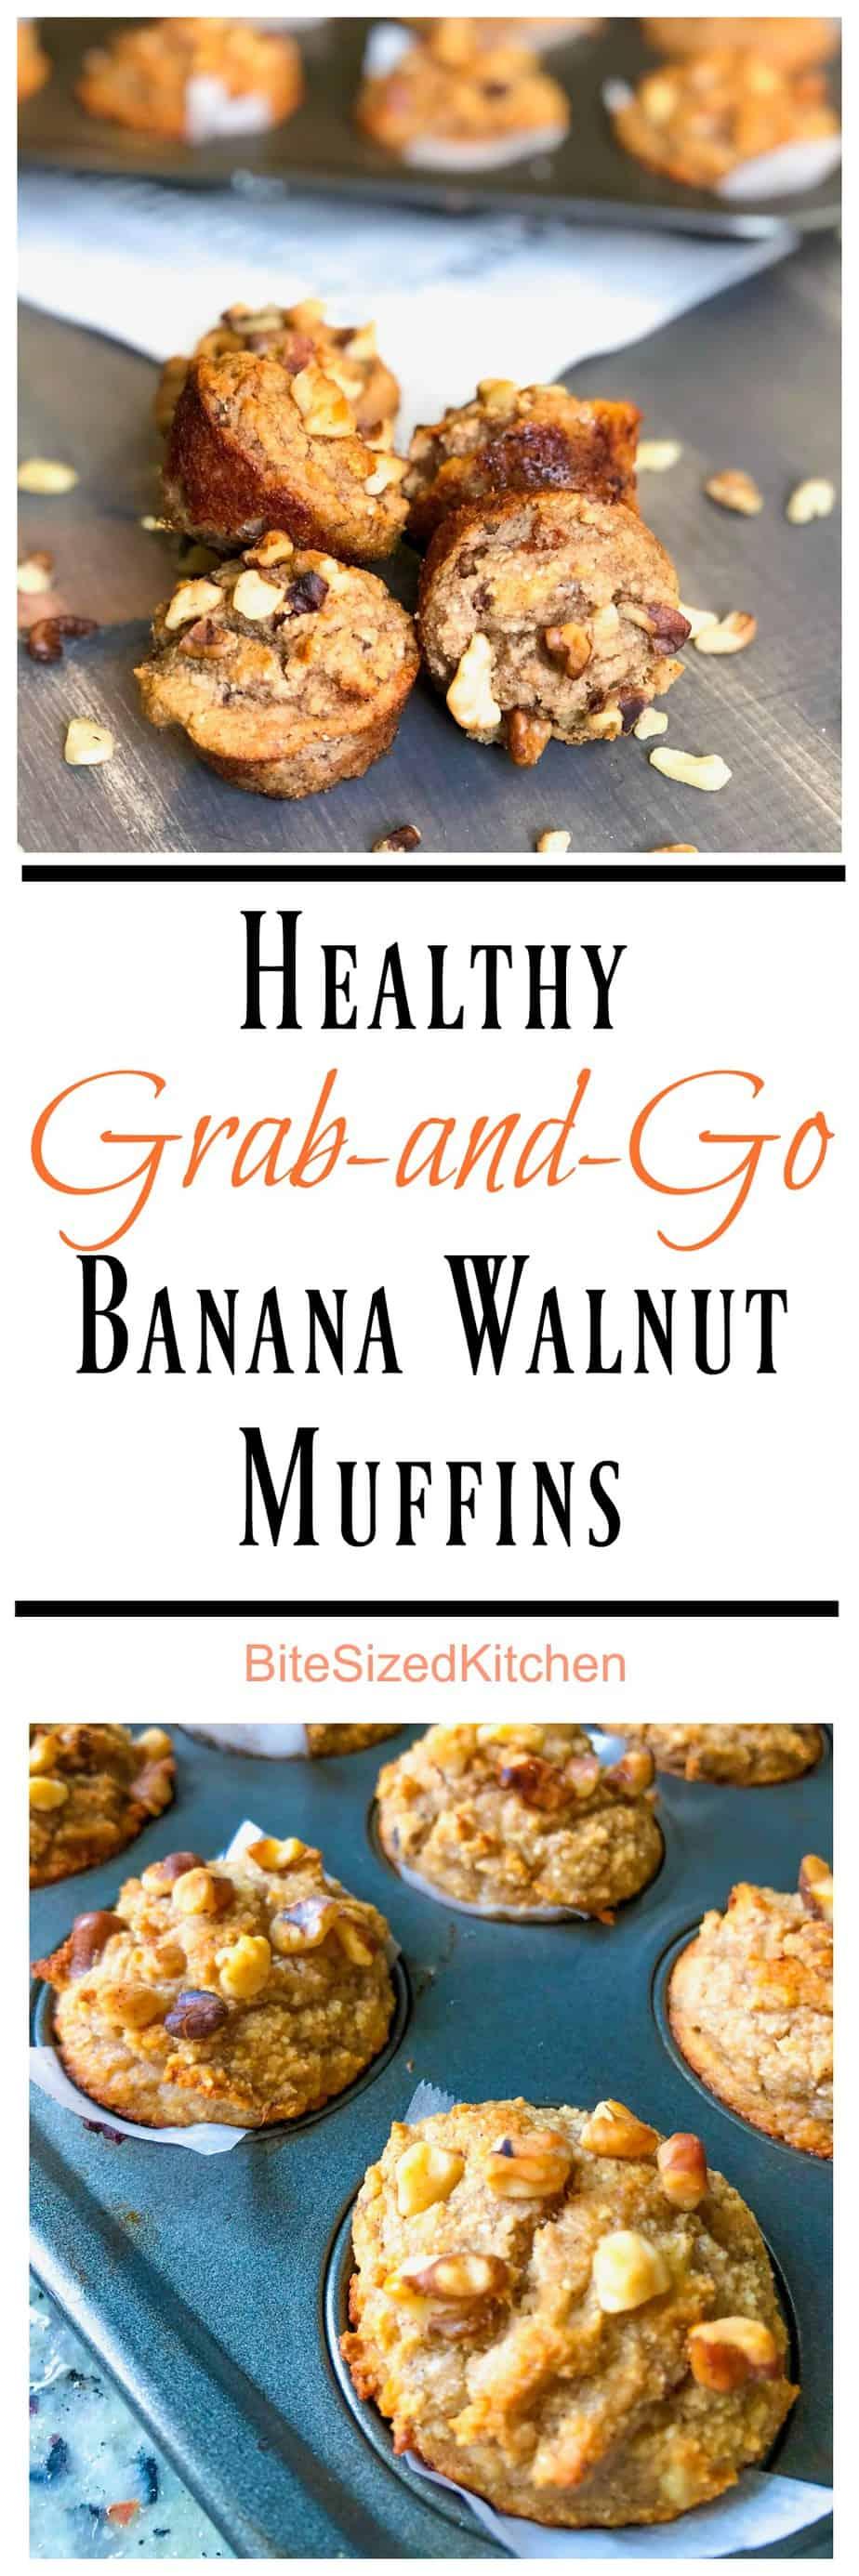 Easy To-Go Breakfast Recipe Healthy Grab-and-Go Banana Walnut Muffins